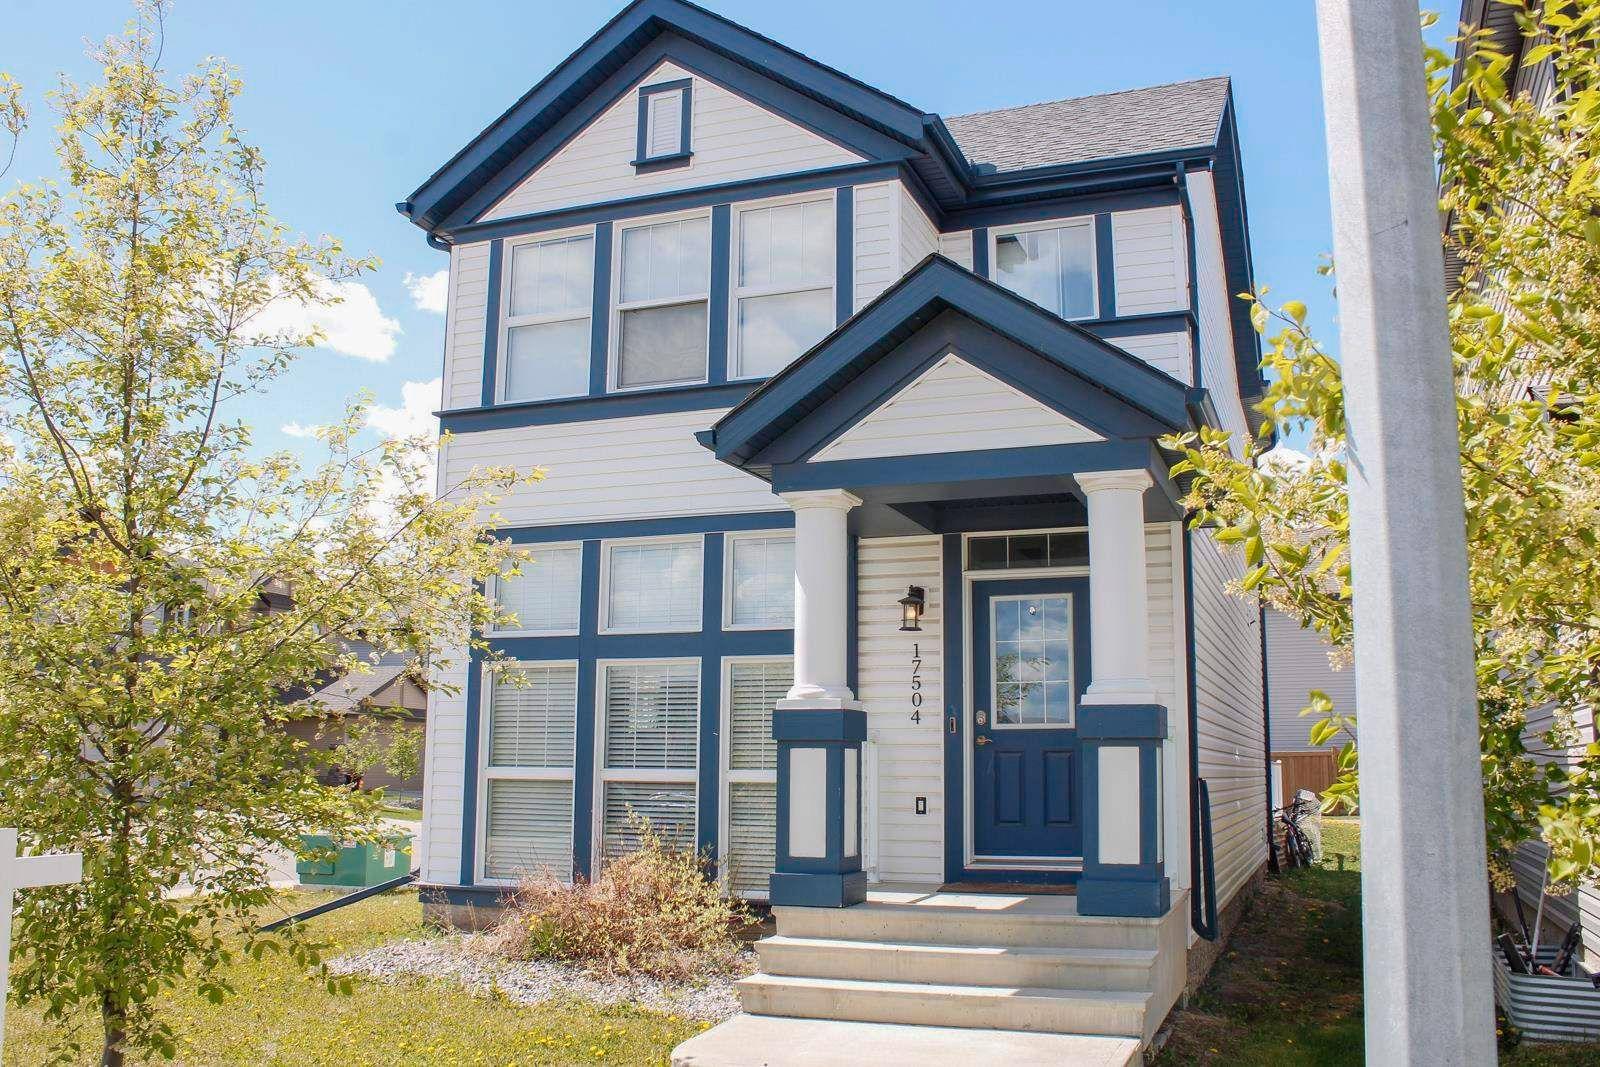 Main Photo: 17504 58 Street in Edmonton: Zone 03 House for sale : MLS®# E4244761